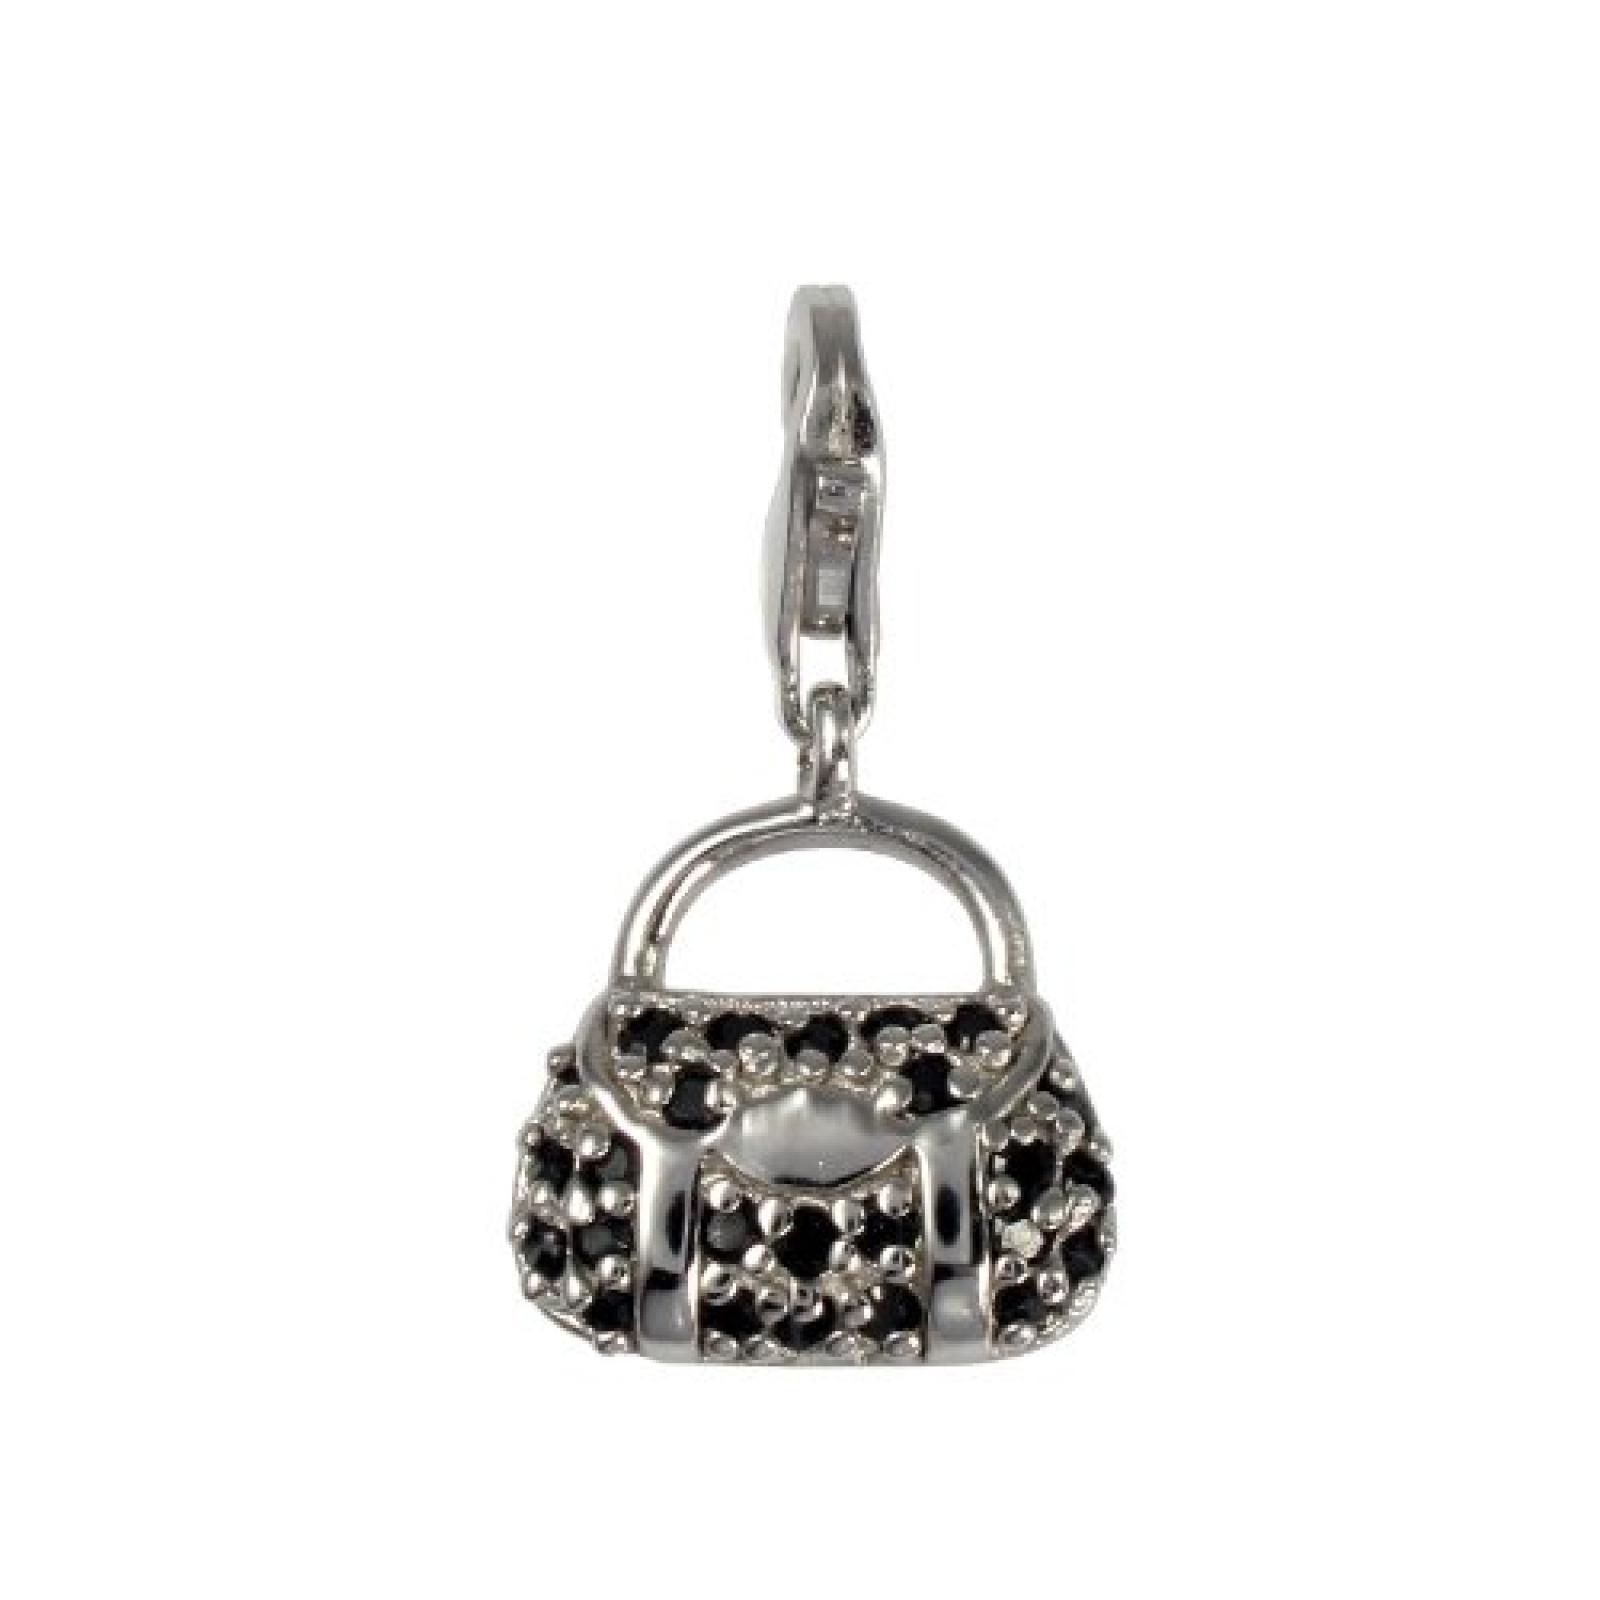 Amor Damen Handtasche-Charm  925 Sterlingsilber 20 mm 309301